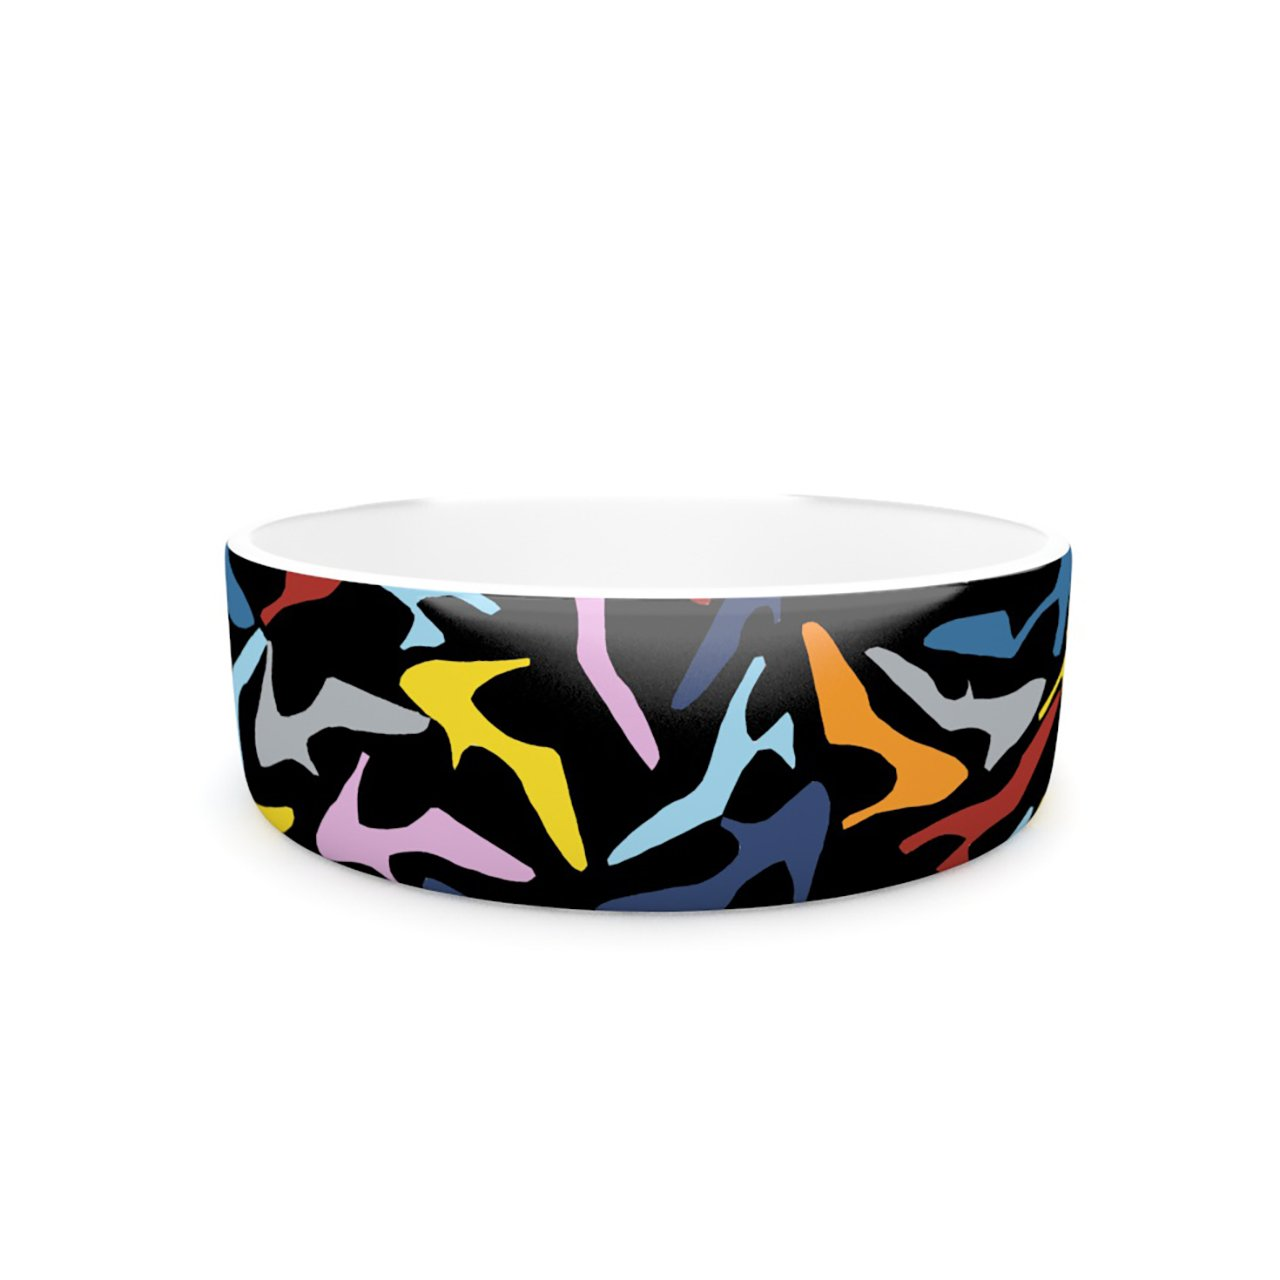 Kess InHouse Project M shoes on Black  Pet Bowl, 7-Inch